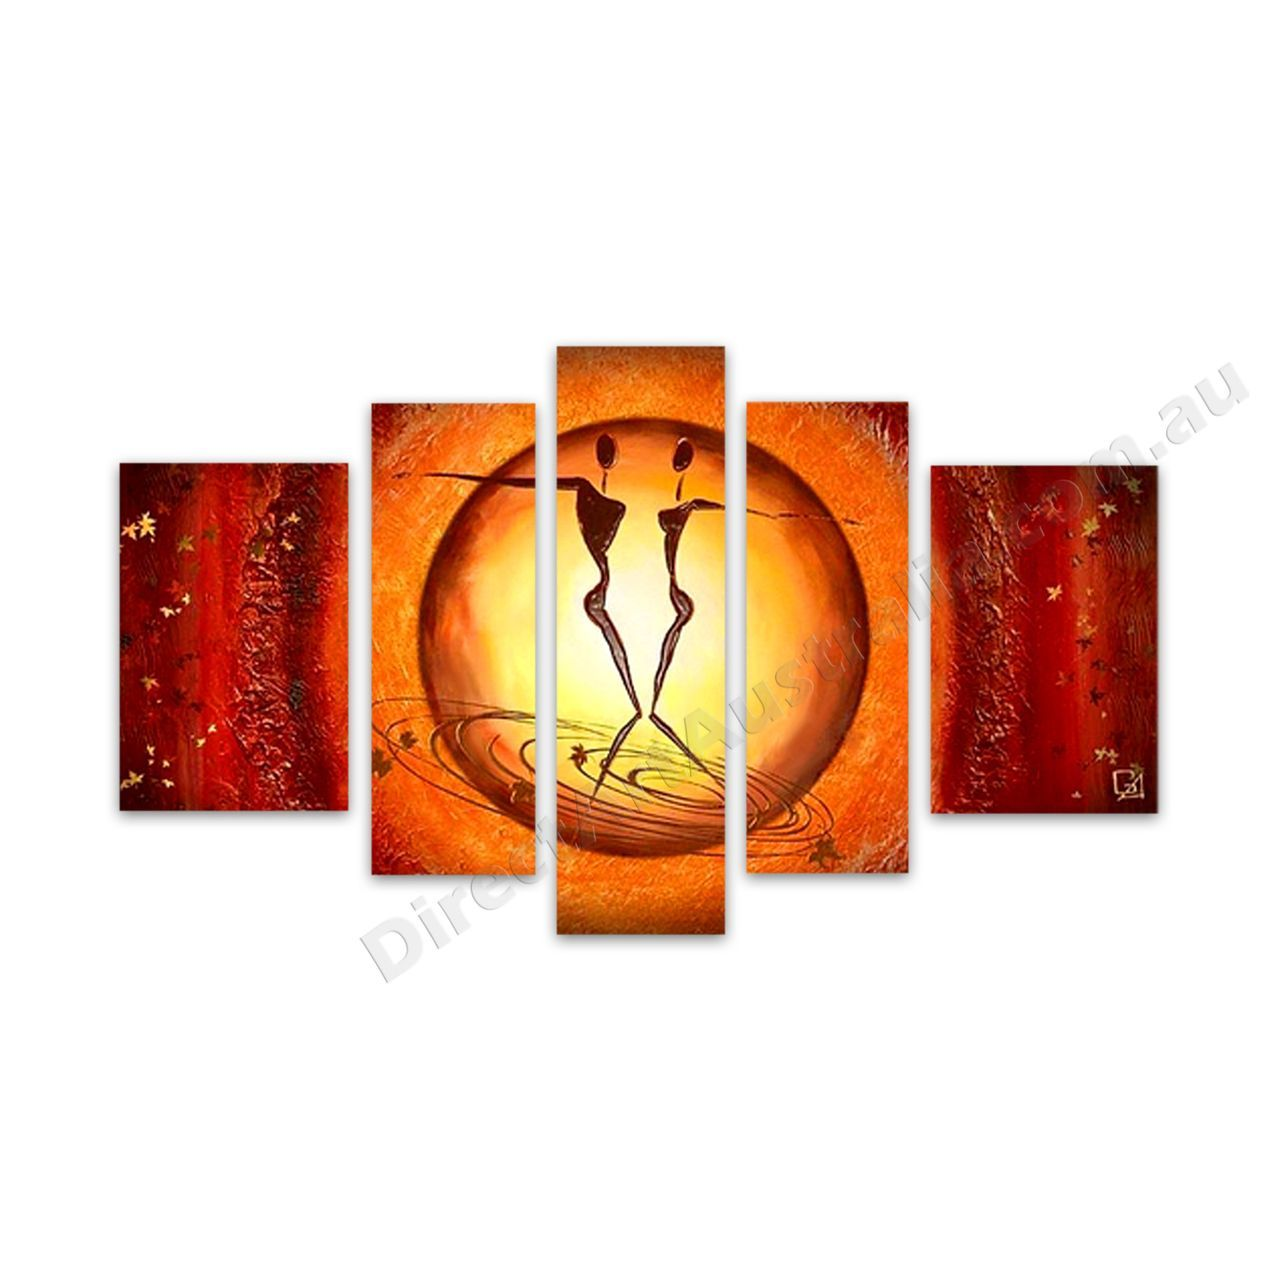 Cheap oil canvas paintings for sale online gold coast art artist artwork wallart wall decor buyartartworks